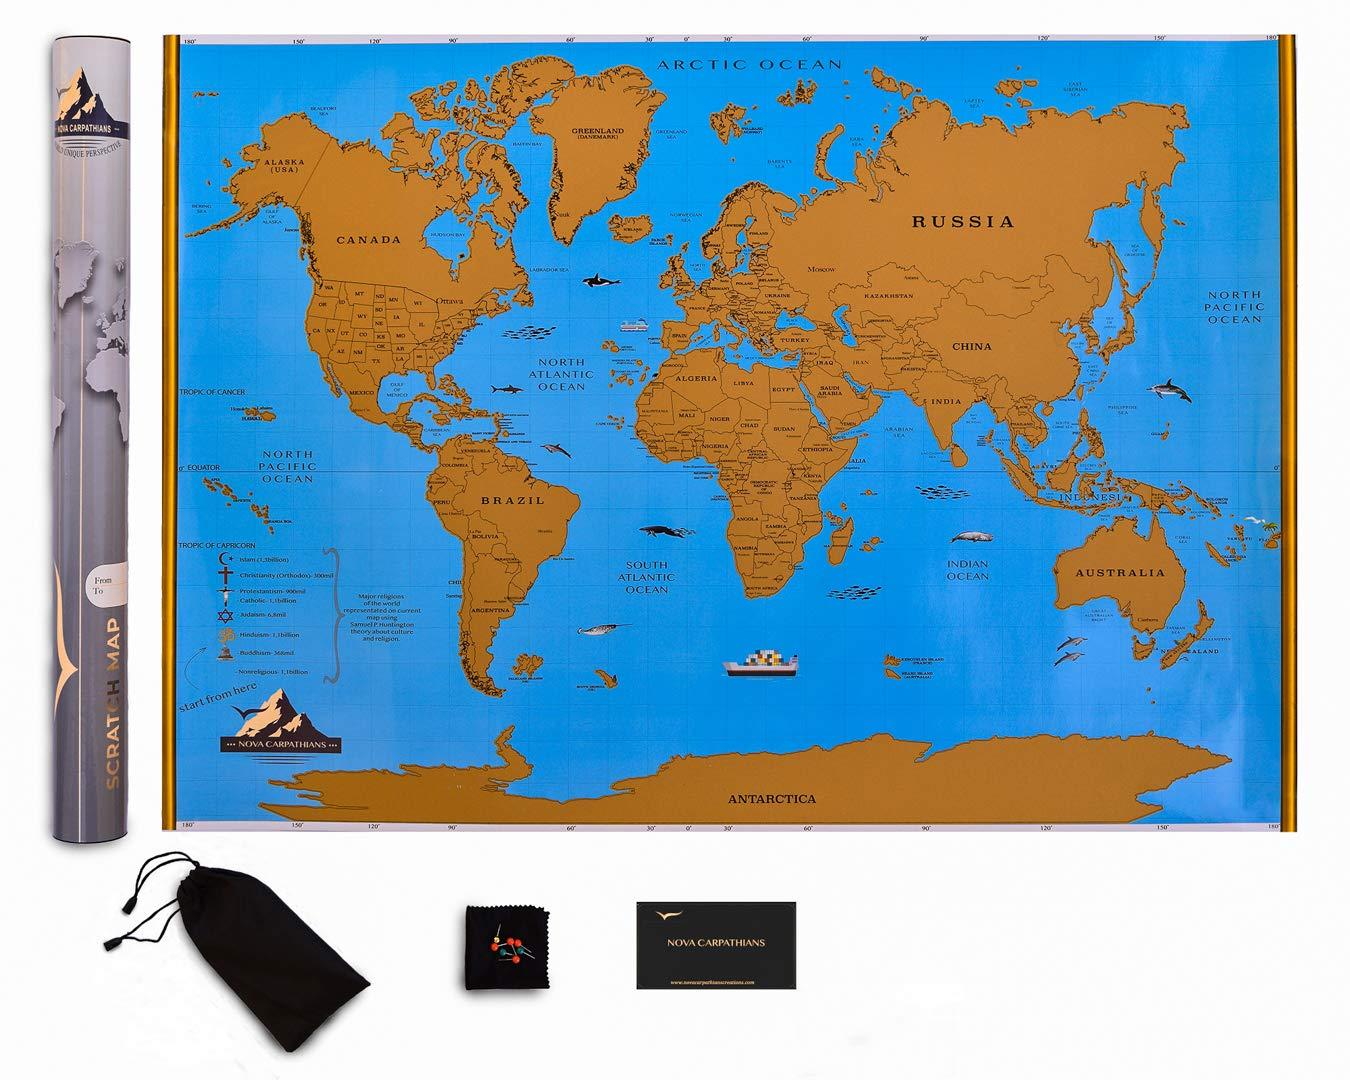 Amazon.com : Nova Carpathians Scratch The World Travel Map - Scratch ...